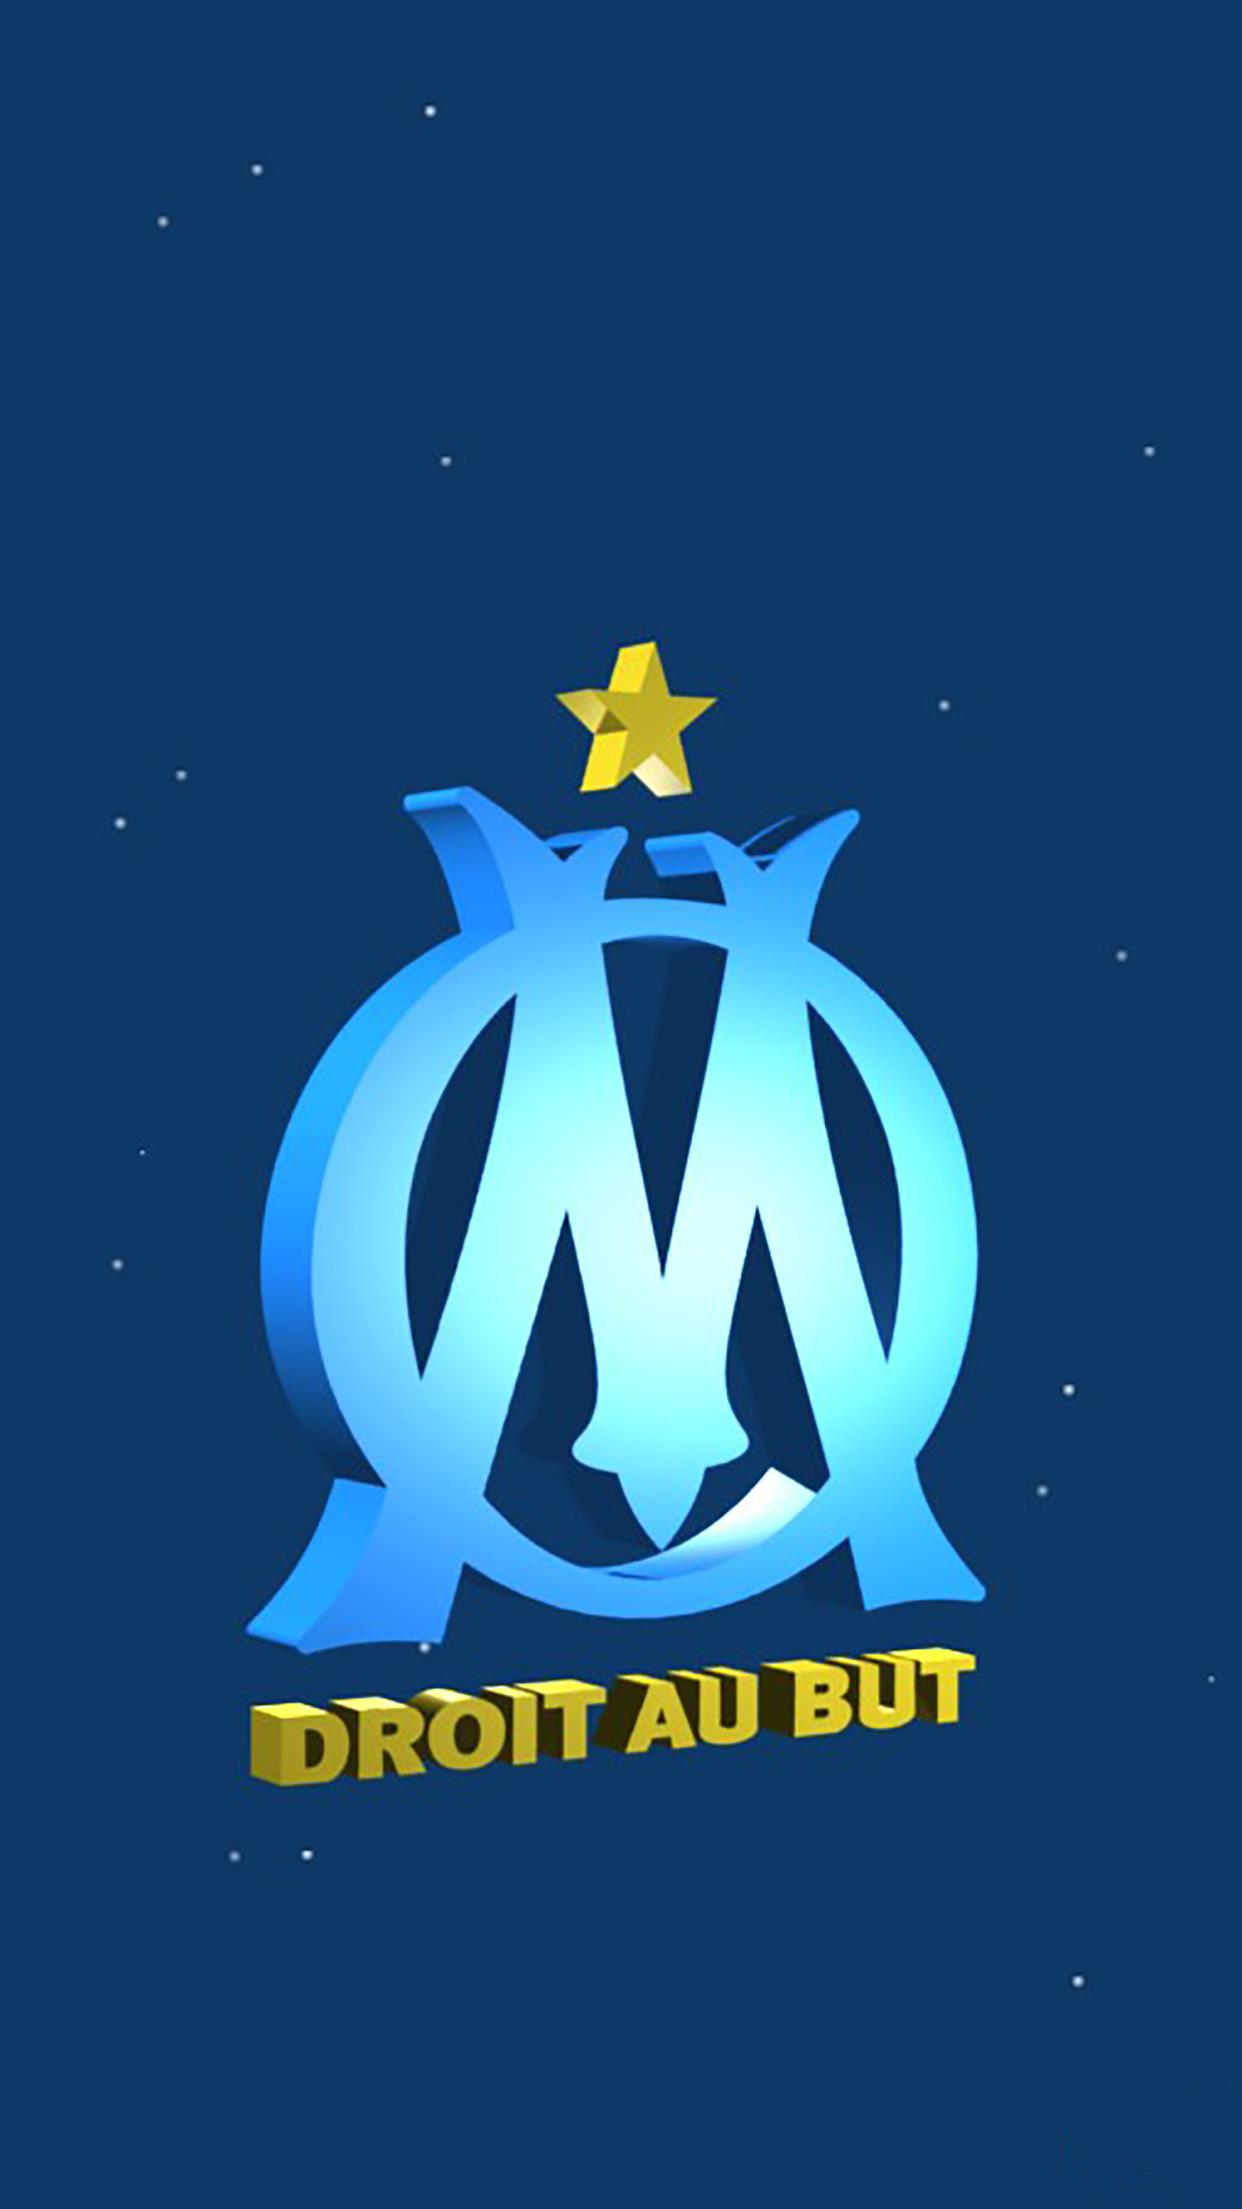 olympique de marseille logo 3 wallpaper for iphone x 8